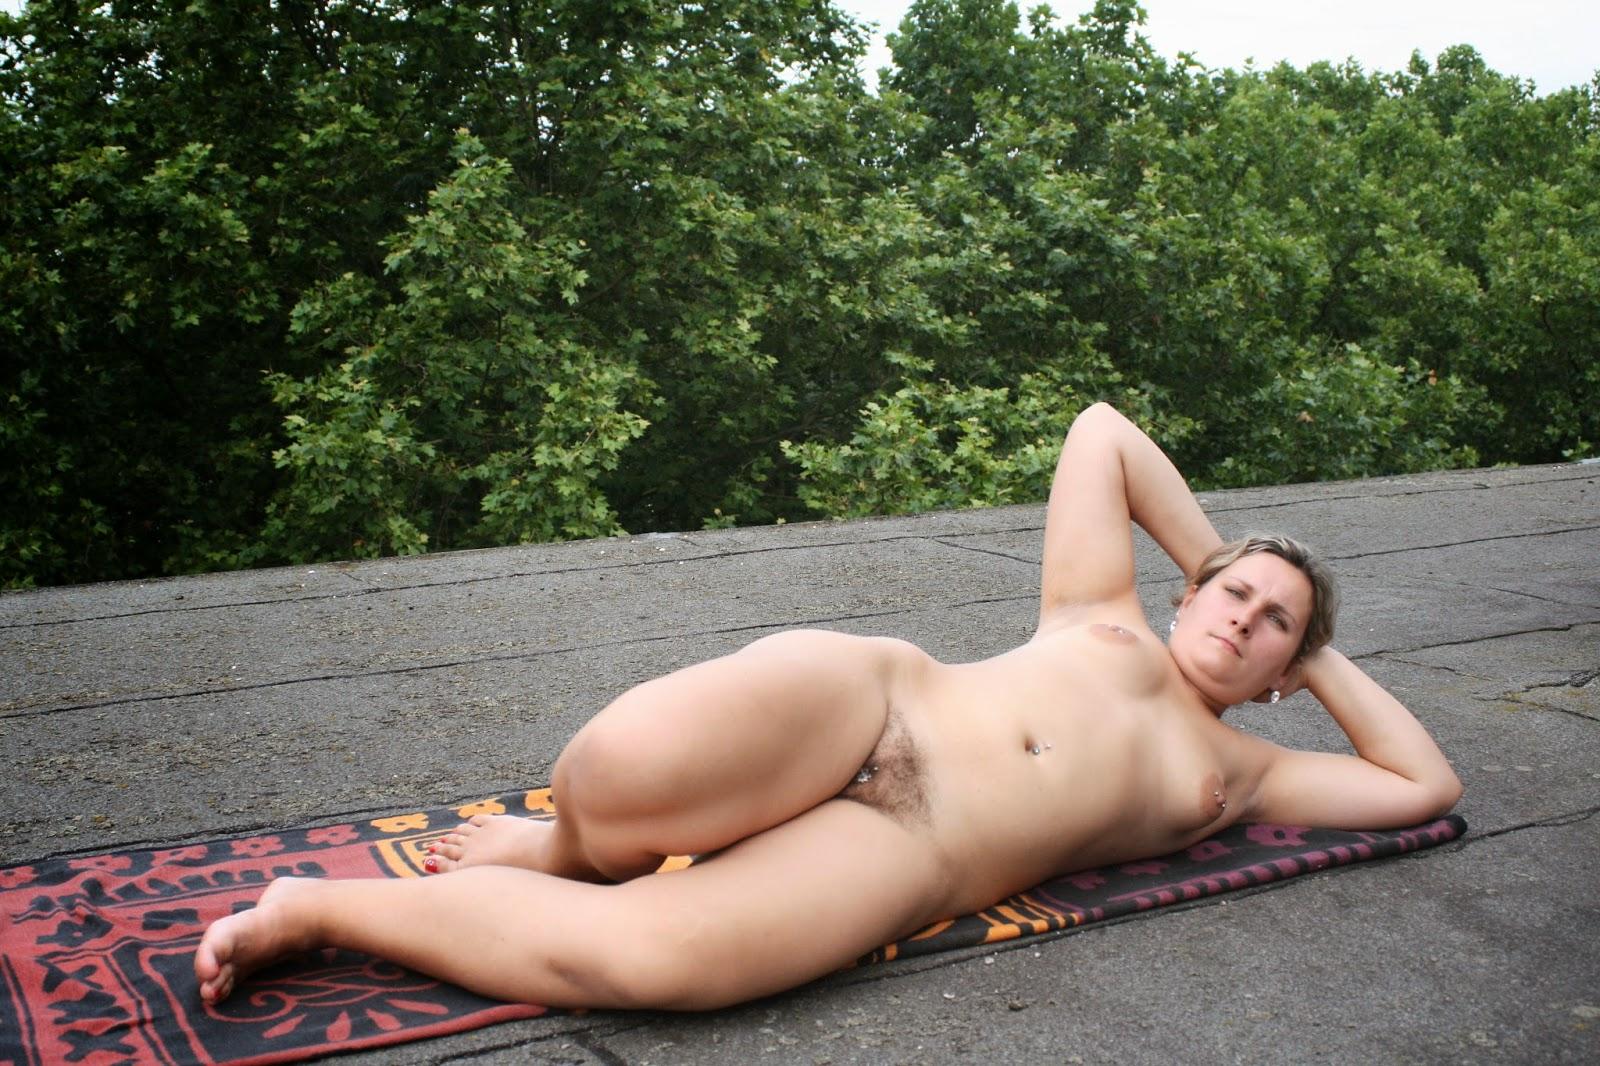 Nude On Roof 70